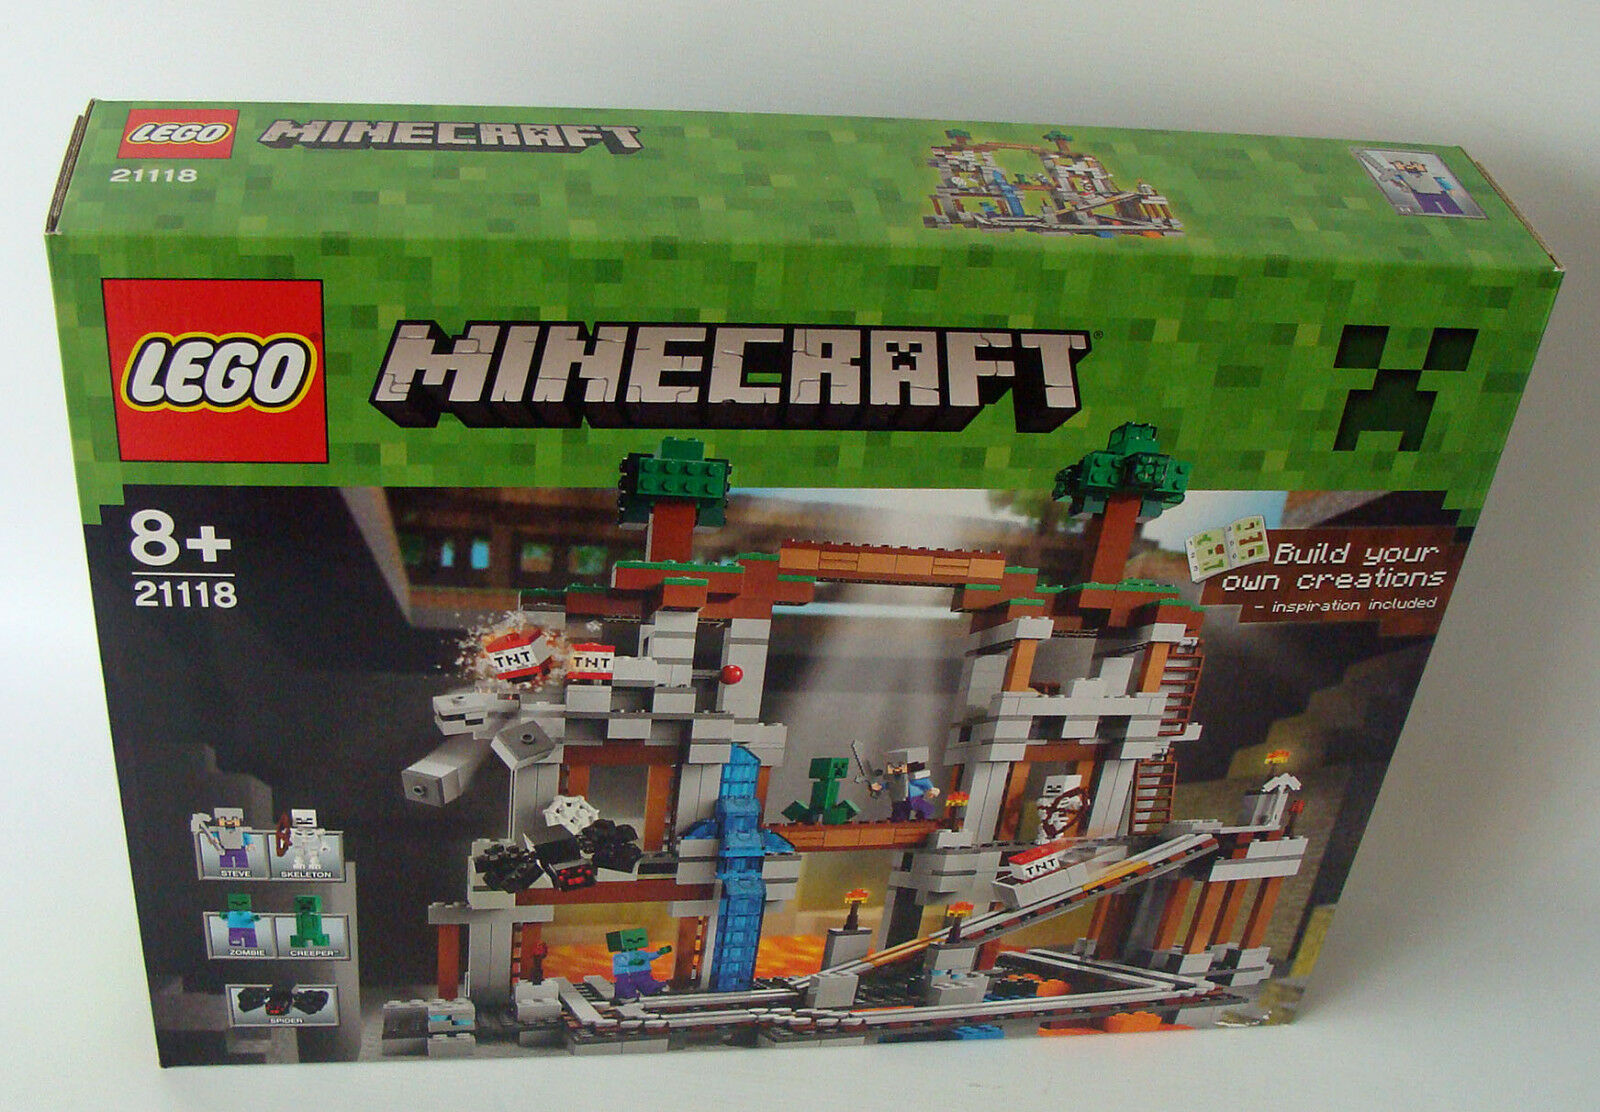 Lego ® Minecraft 21118-mina 926 piezas 8+ nuevo new